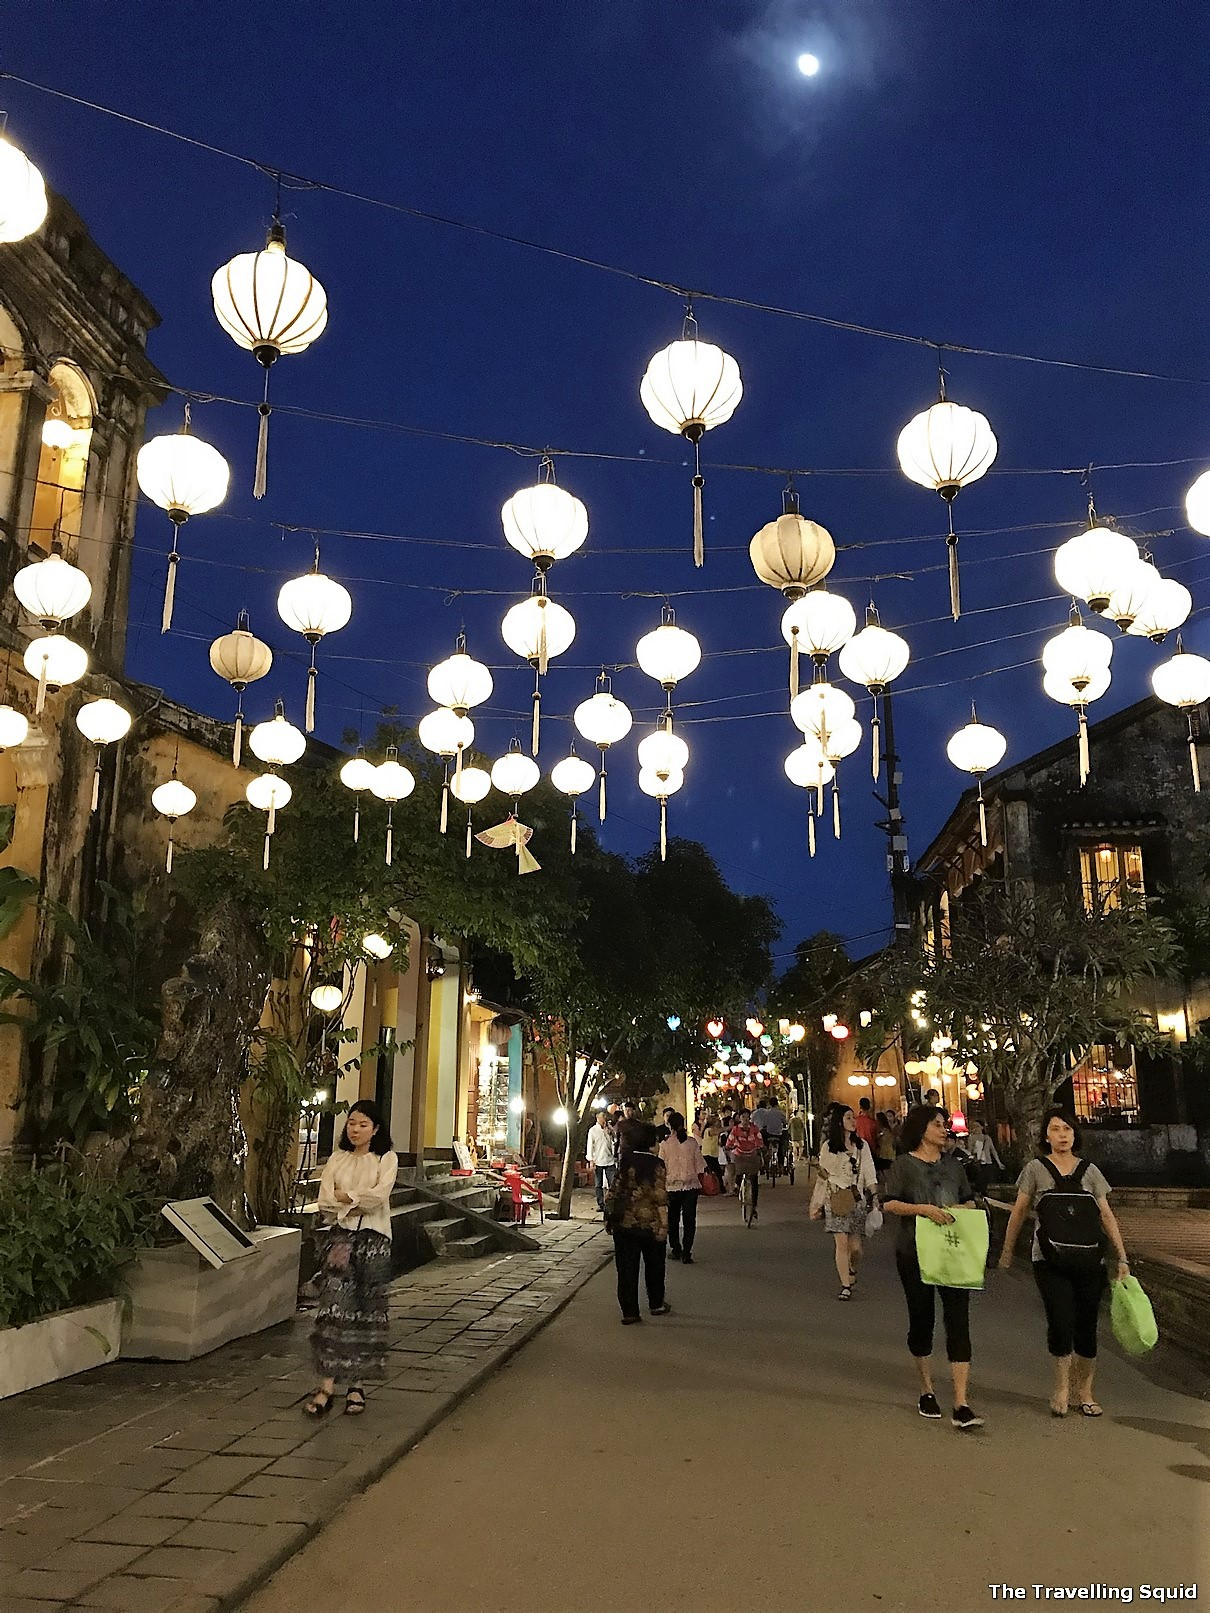 hoi an old town vietnam night lanterns